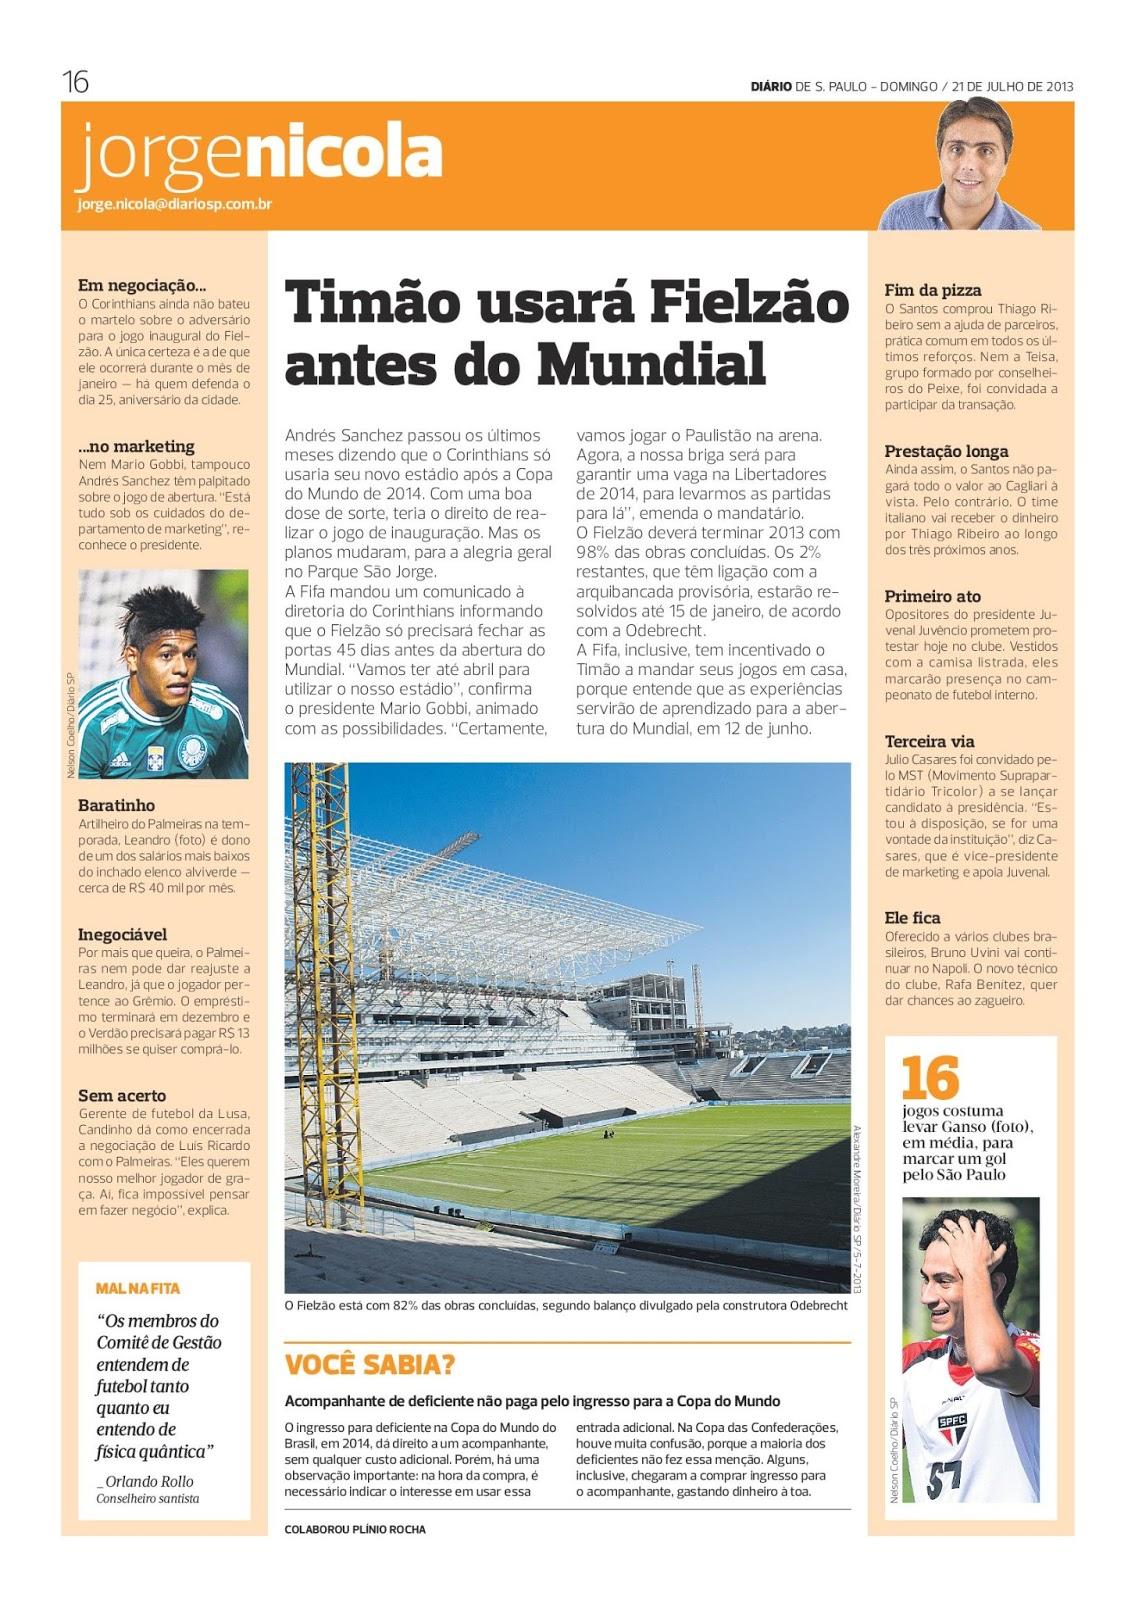 Blog do Jorge Nicola  Julho 2013 6549aac5fecba